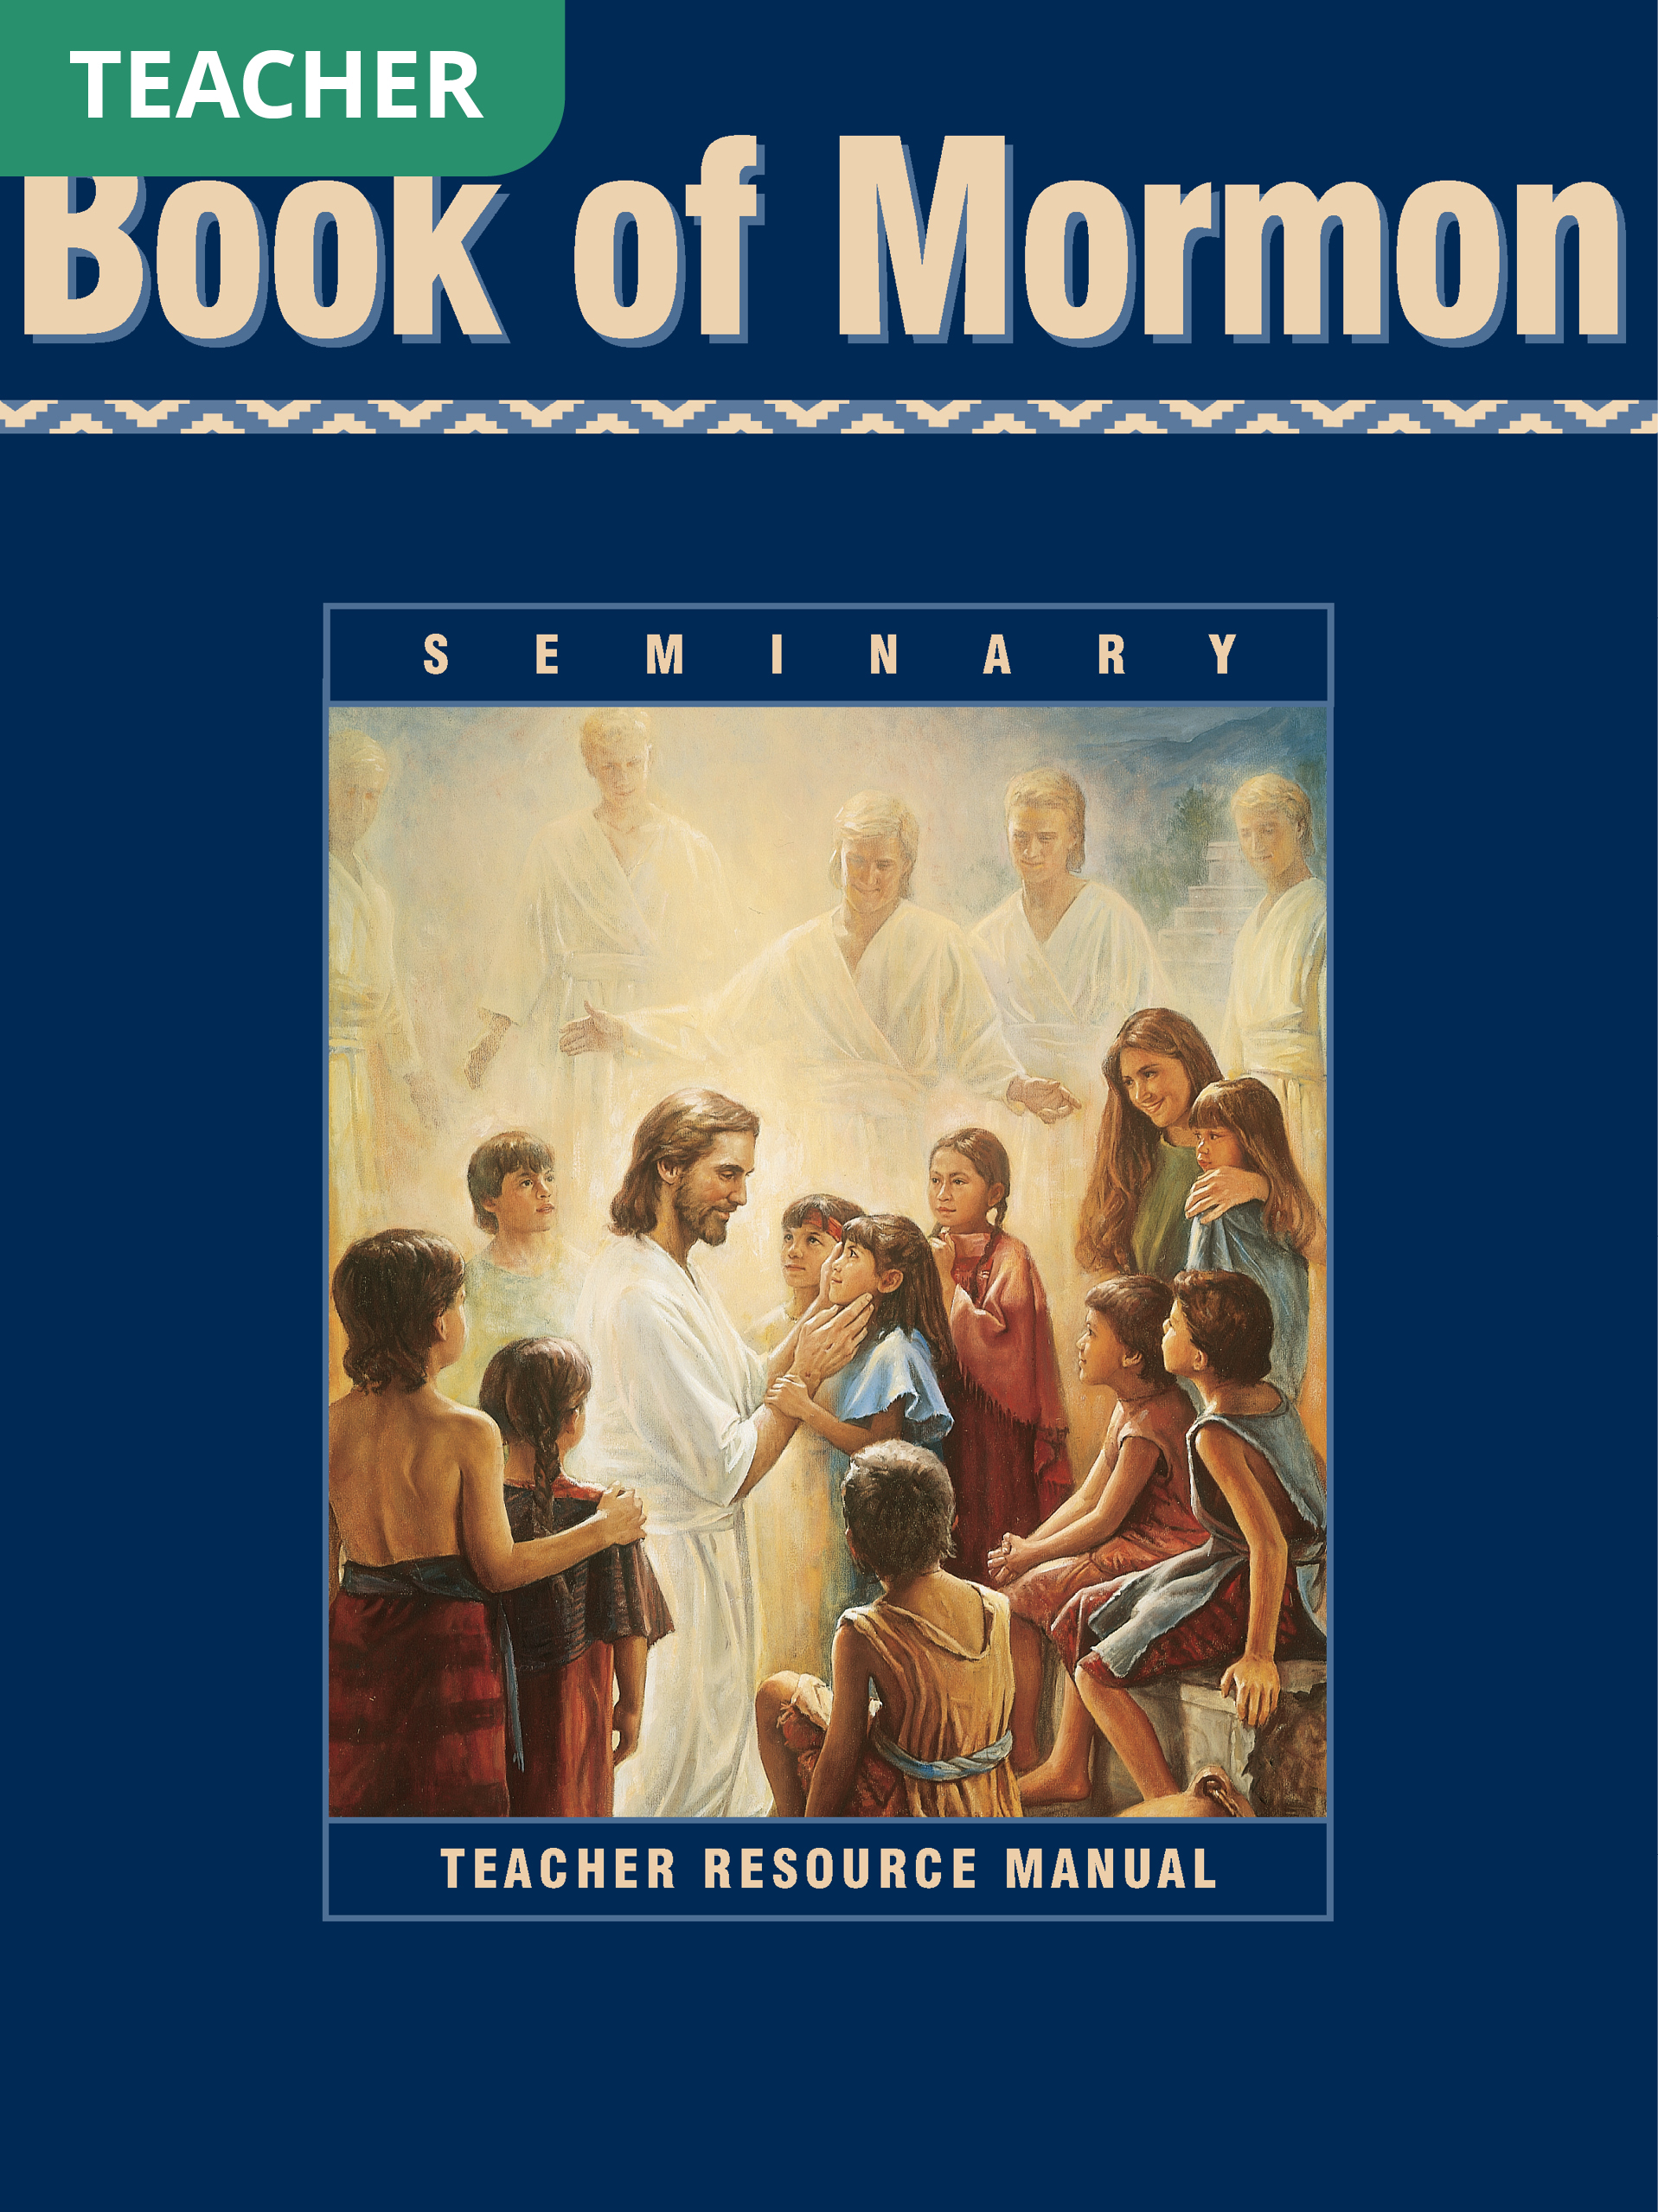 Book of Mormon Seminary Teacher Resource Manual